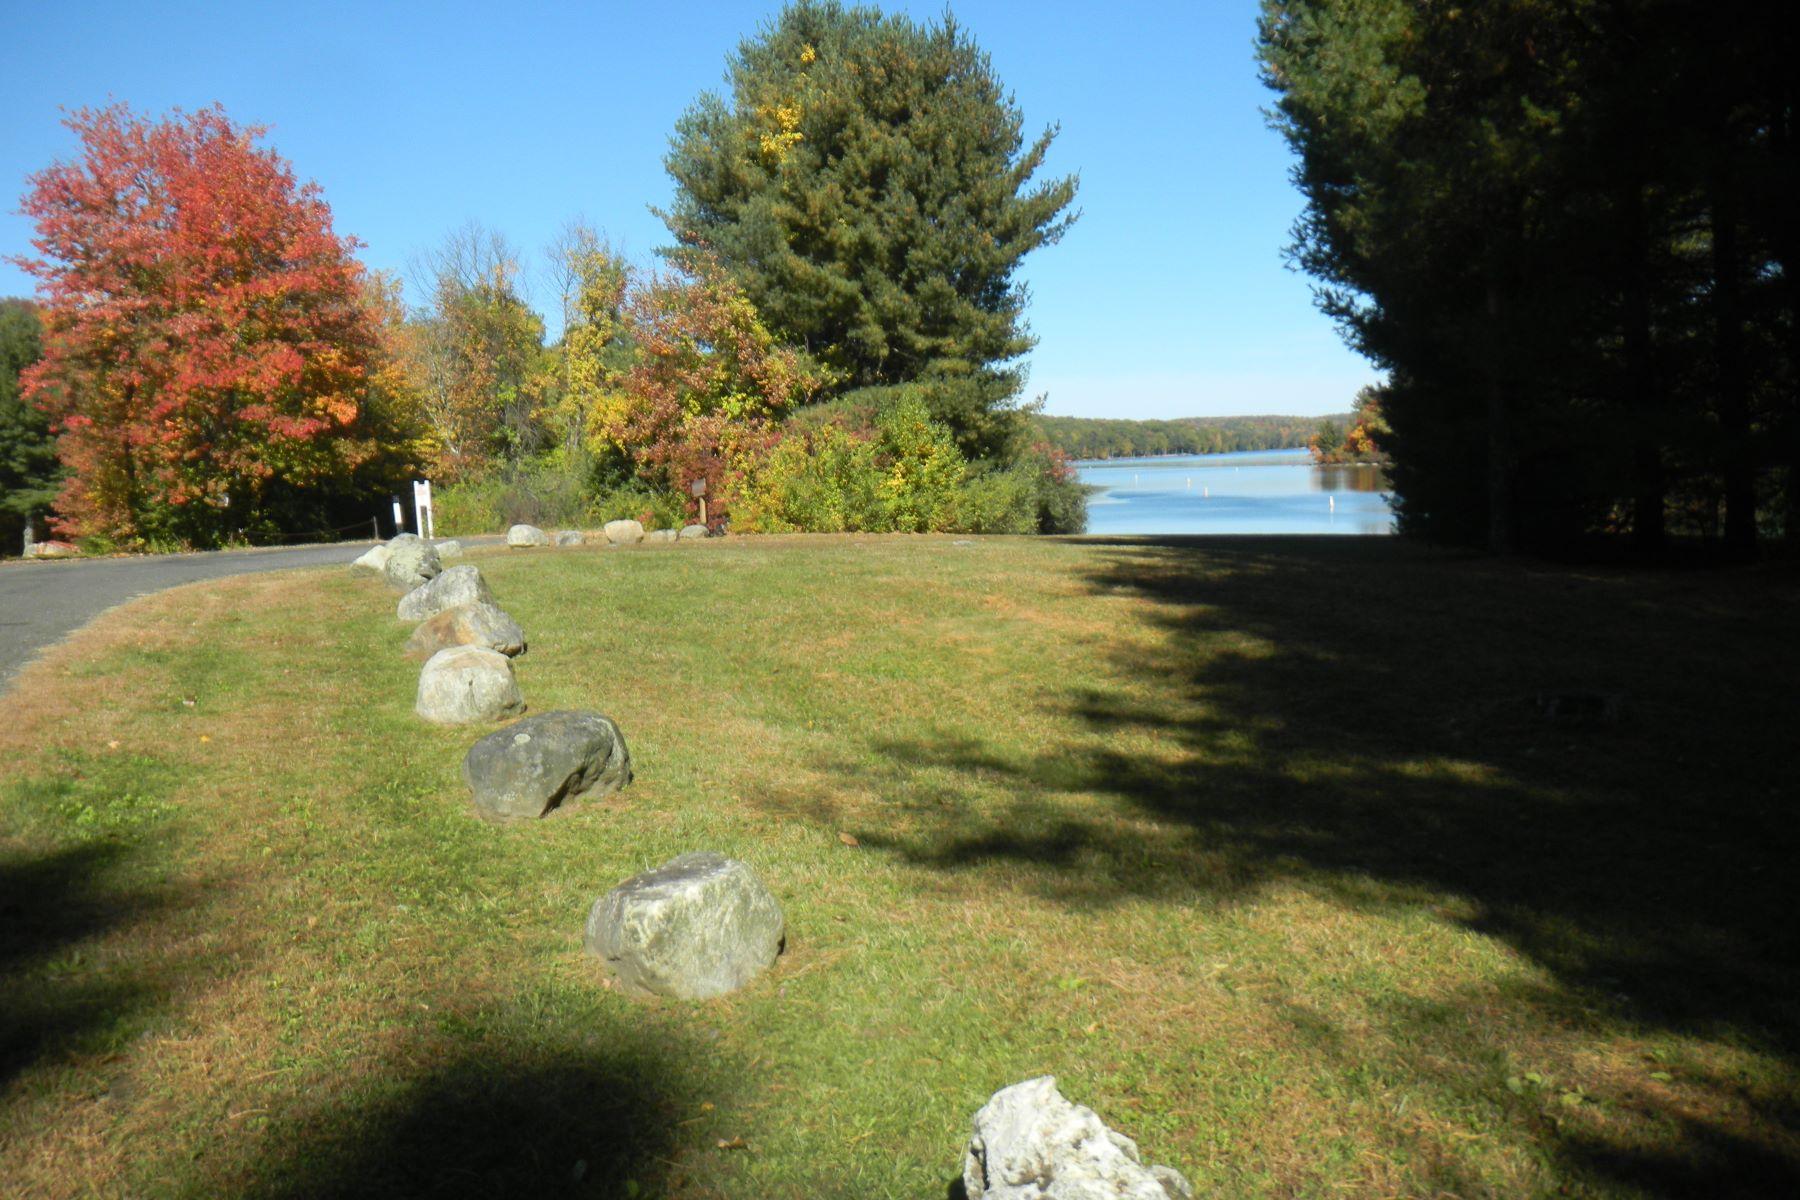 Casa Unifamiliar por un Alquiler en Woodridge Lake Rental 19 Wynnwood Court Goshen, Connecticut, 06756 Estados Unidos